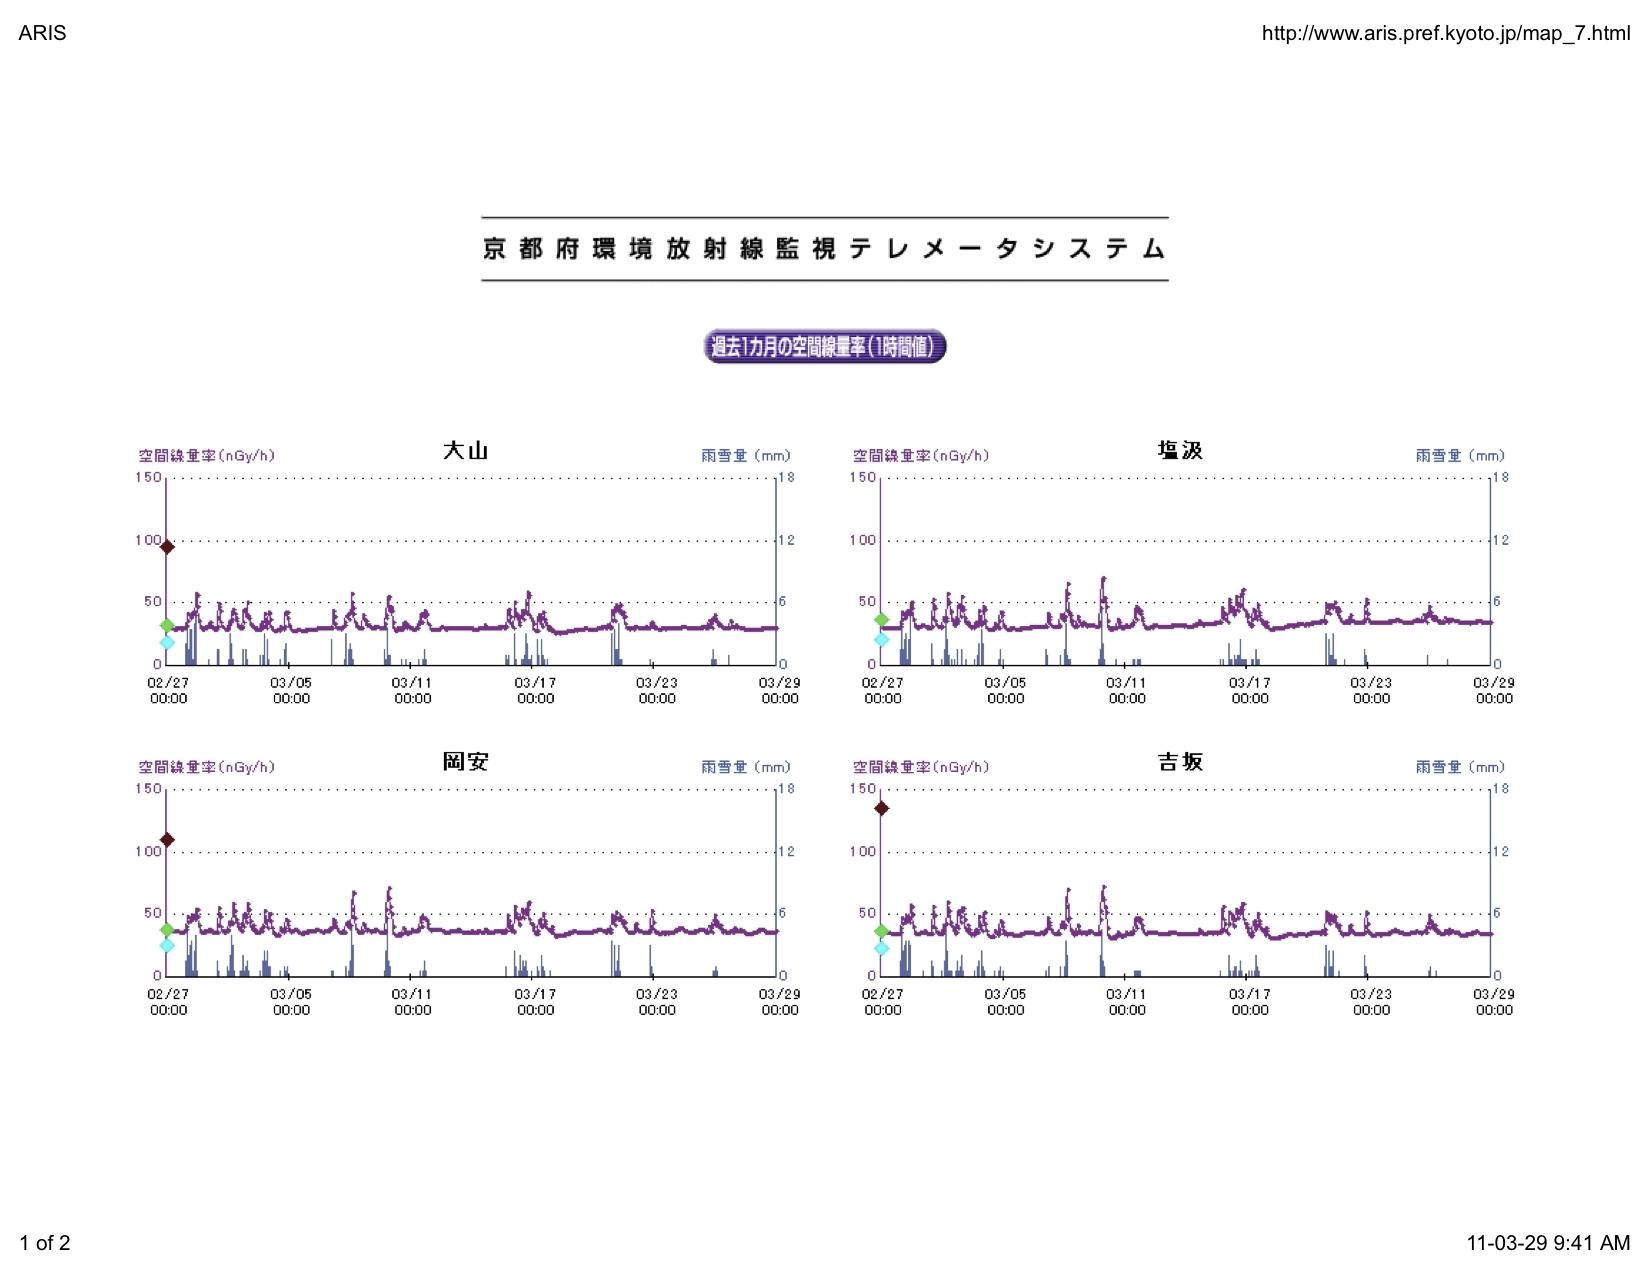 Kyoto radiation graphs.jpg